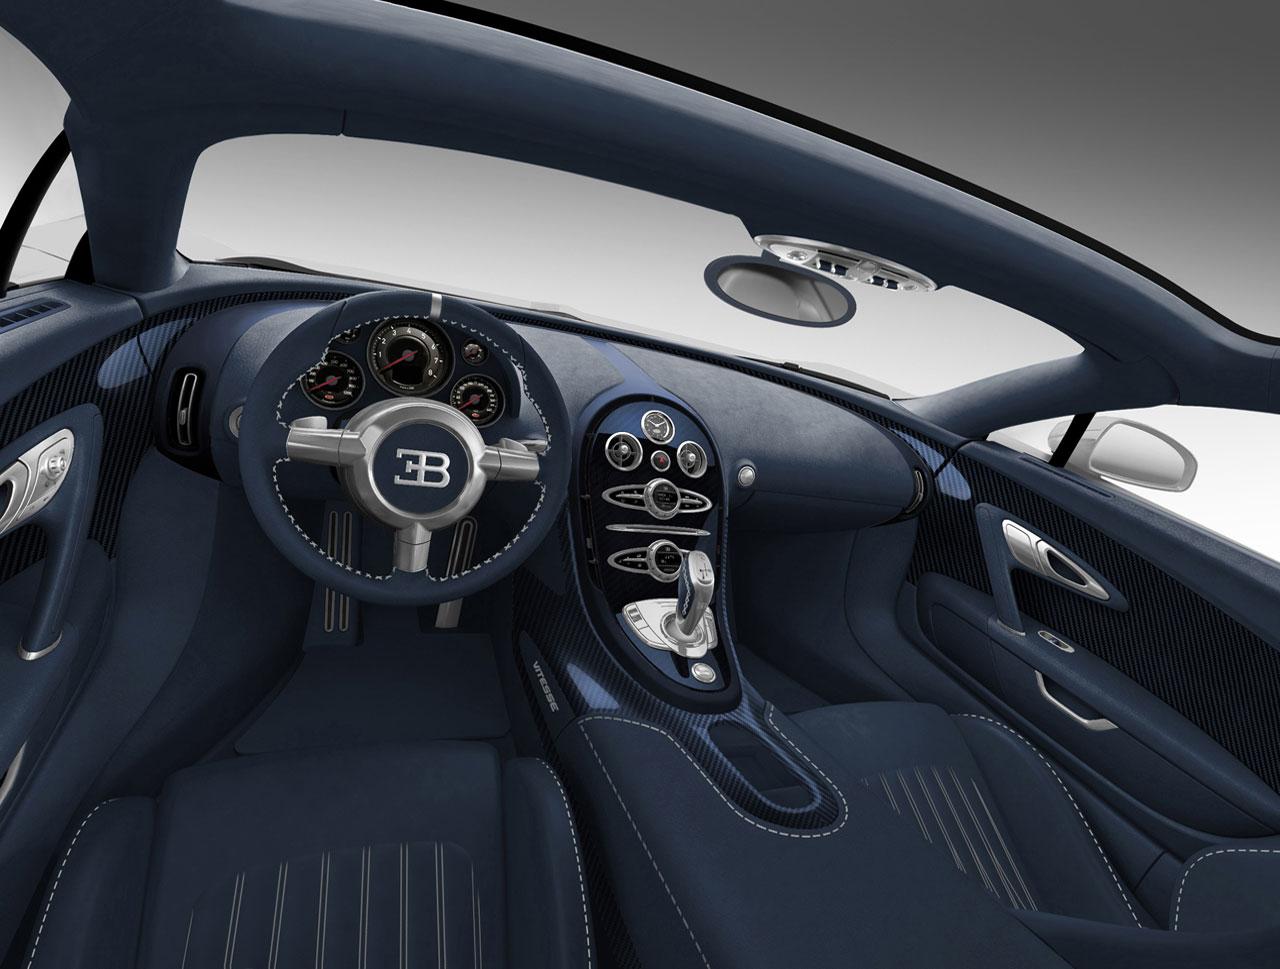 cars model 2013 2014 2015 bugatti brings veyron grand sport vitesse gris rafale to brazil. Black Bedroom Furniture Sets. Home Design Ideas